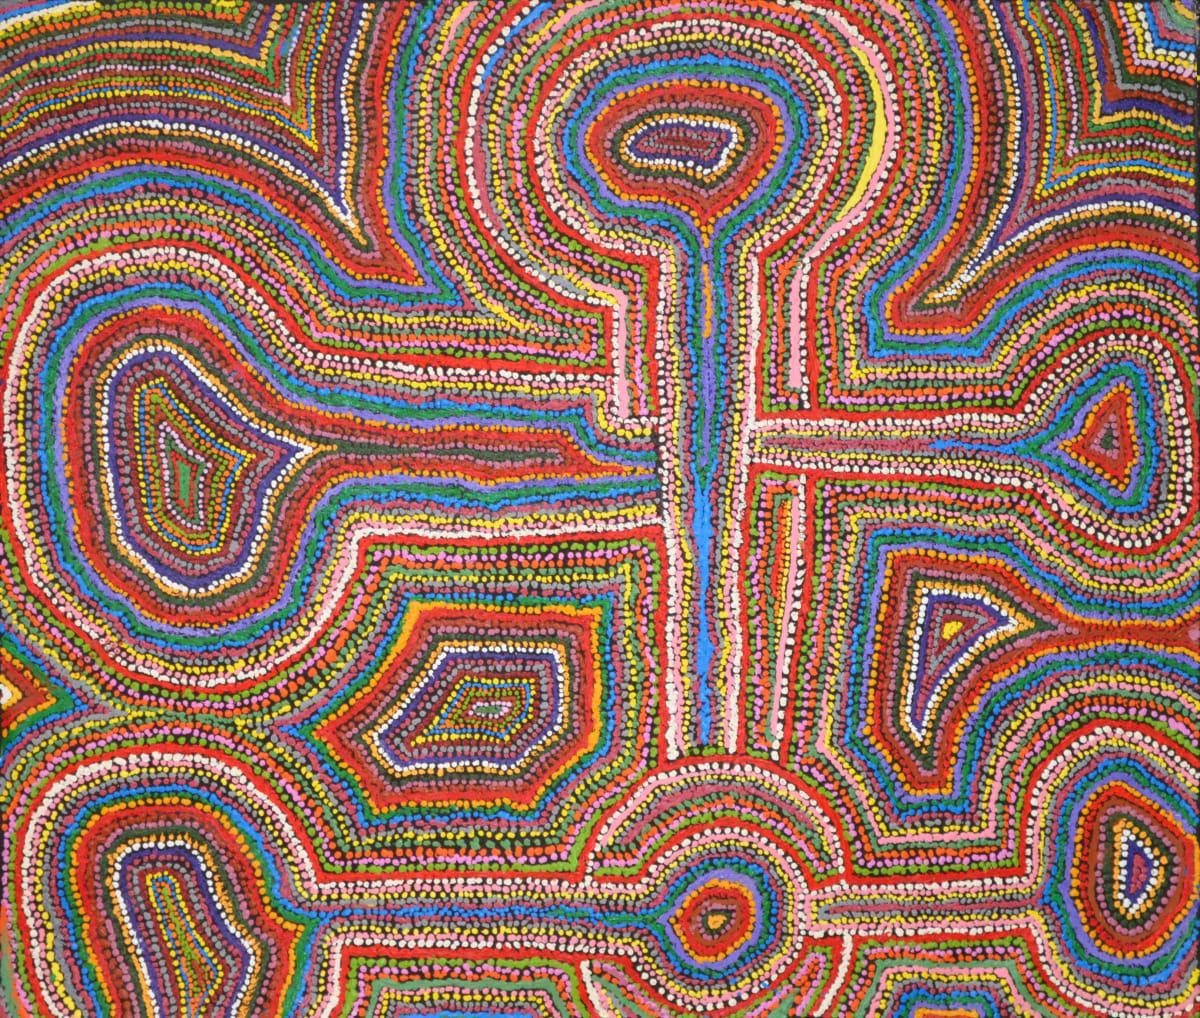 Samuel Miller Ngayuku Ngura acrylic on linen 91 x 107 cm